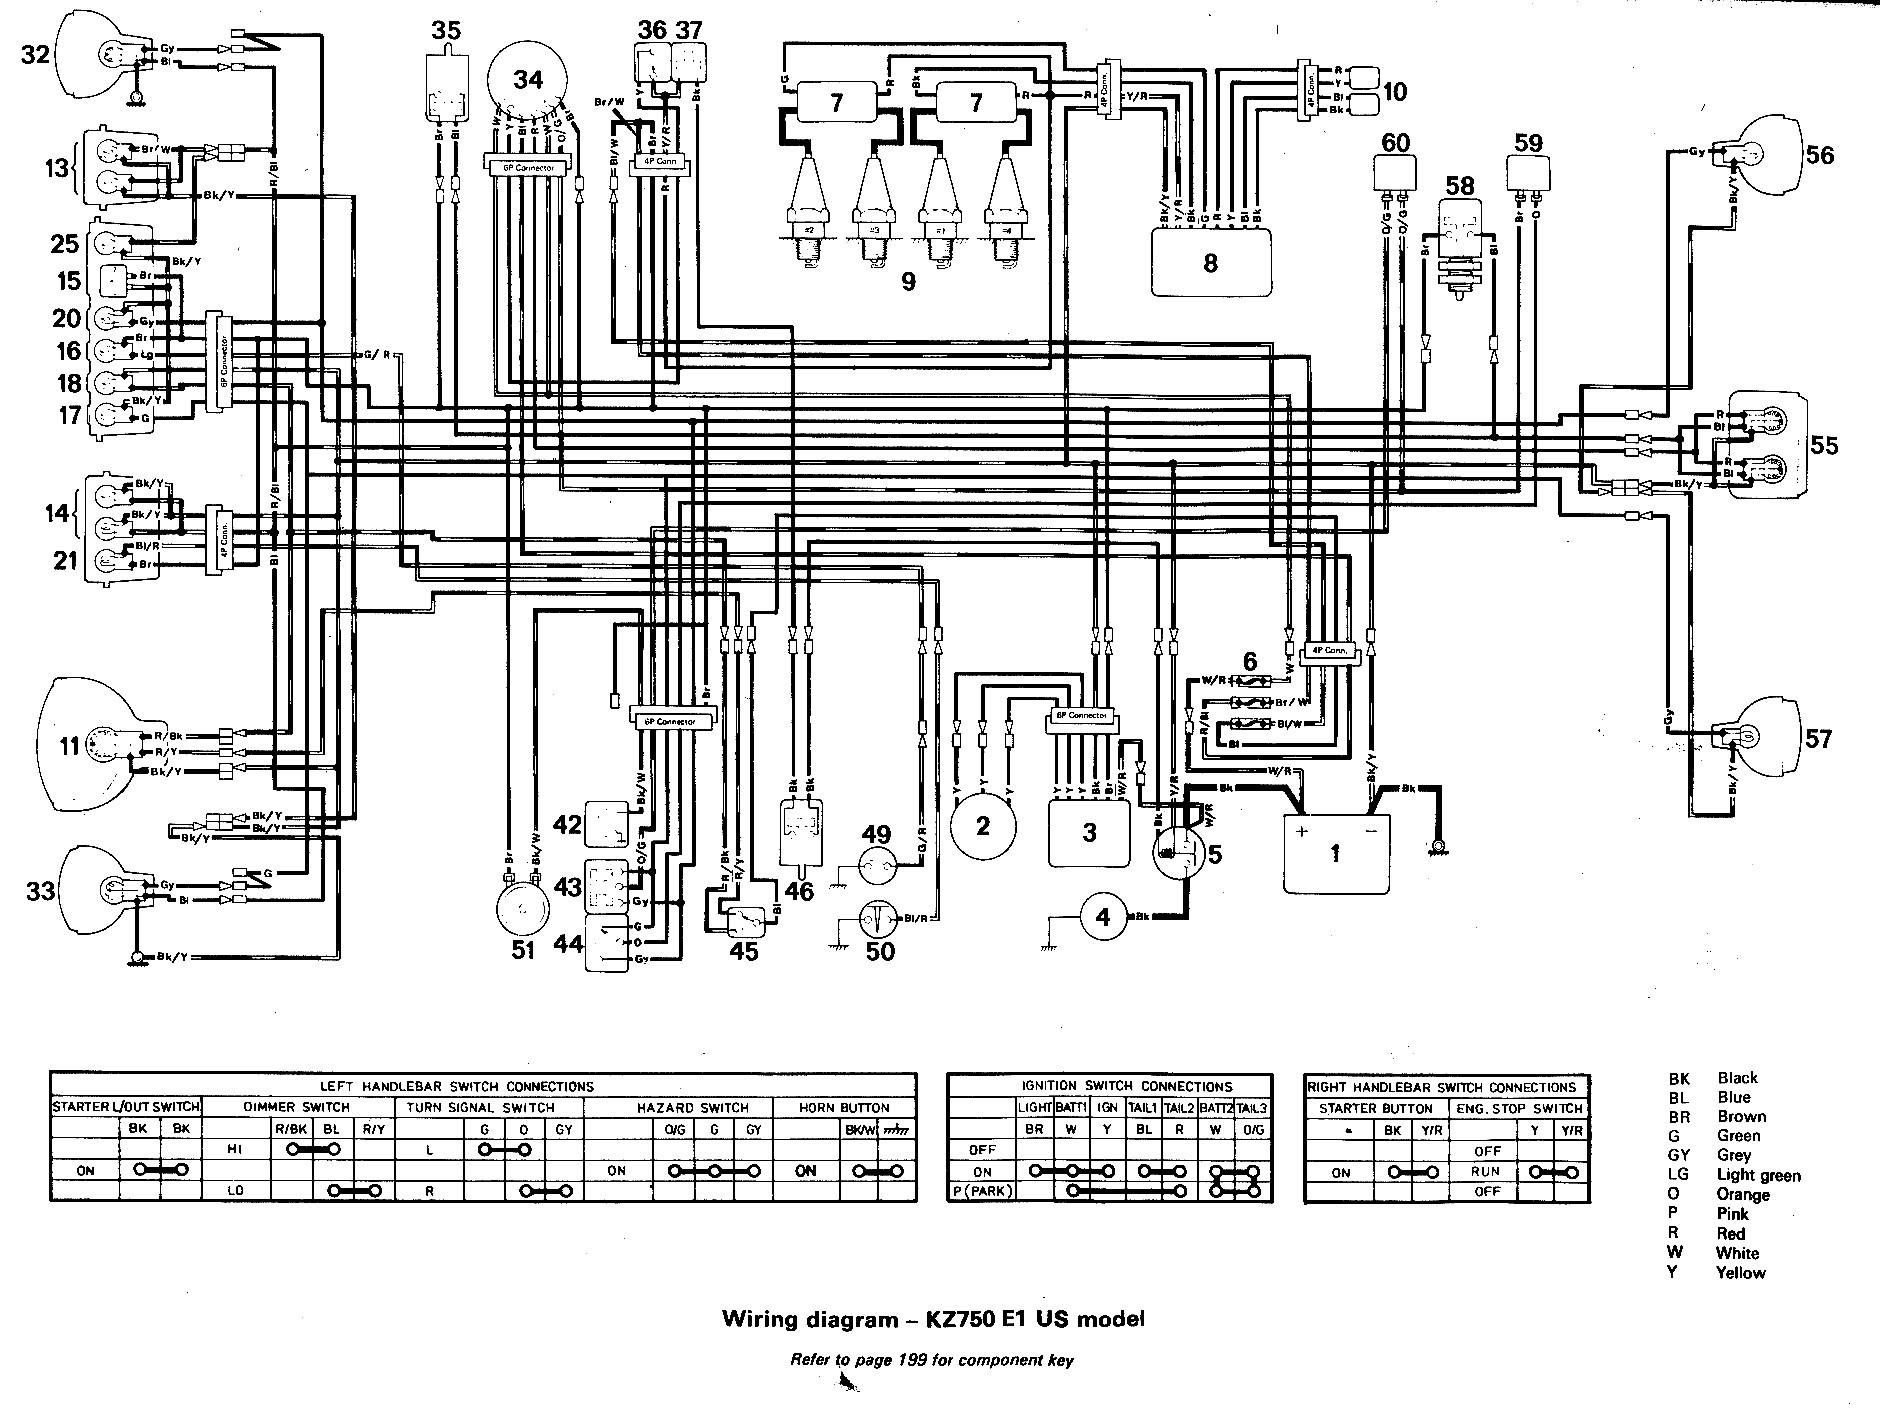 1987 yamaha banshee wiring diagram lifan 110 electric start vega auto electrical images crypton r engine jupiter